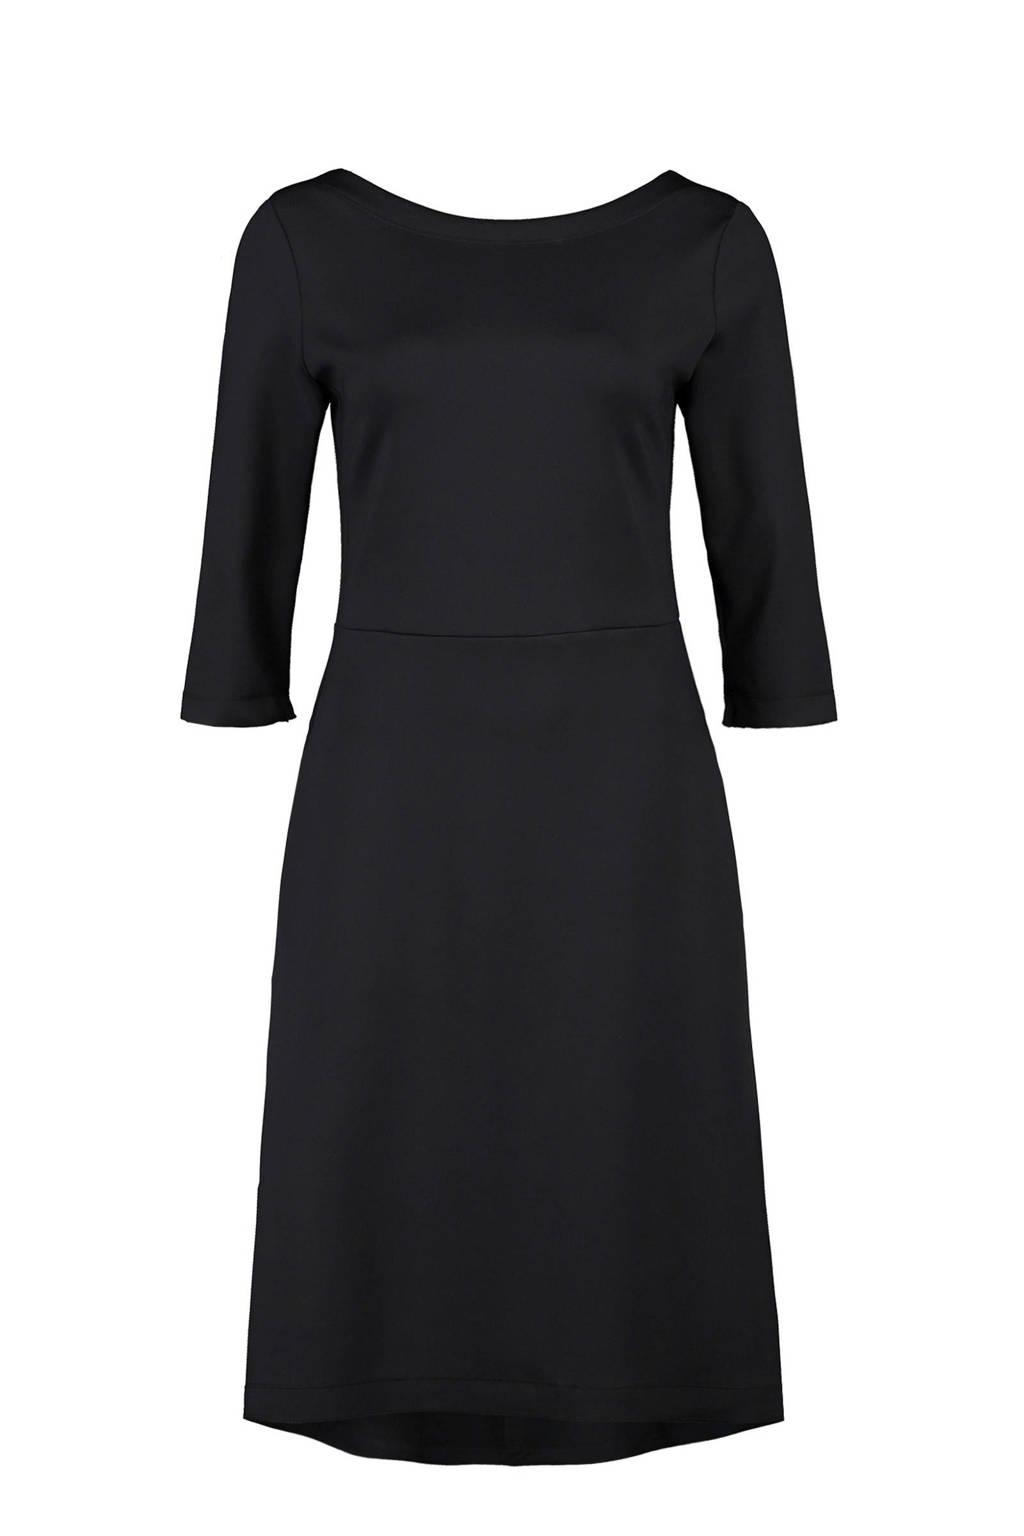 Expresso jurk Arlene zwart, Zwart